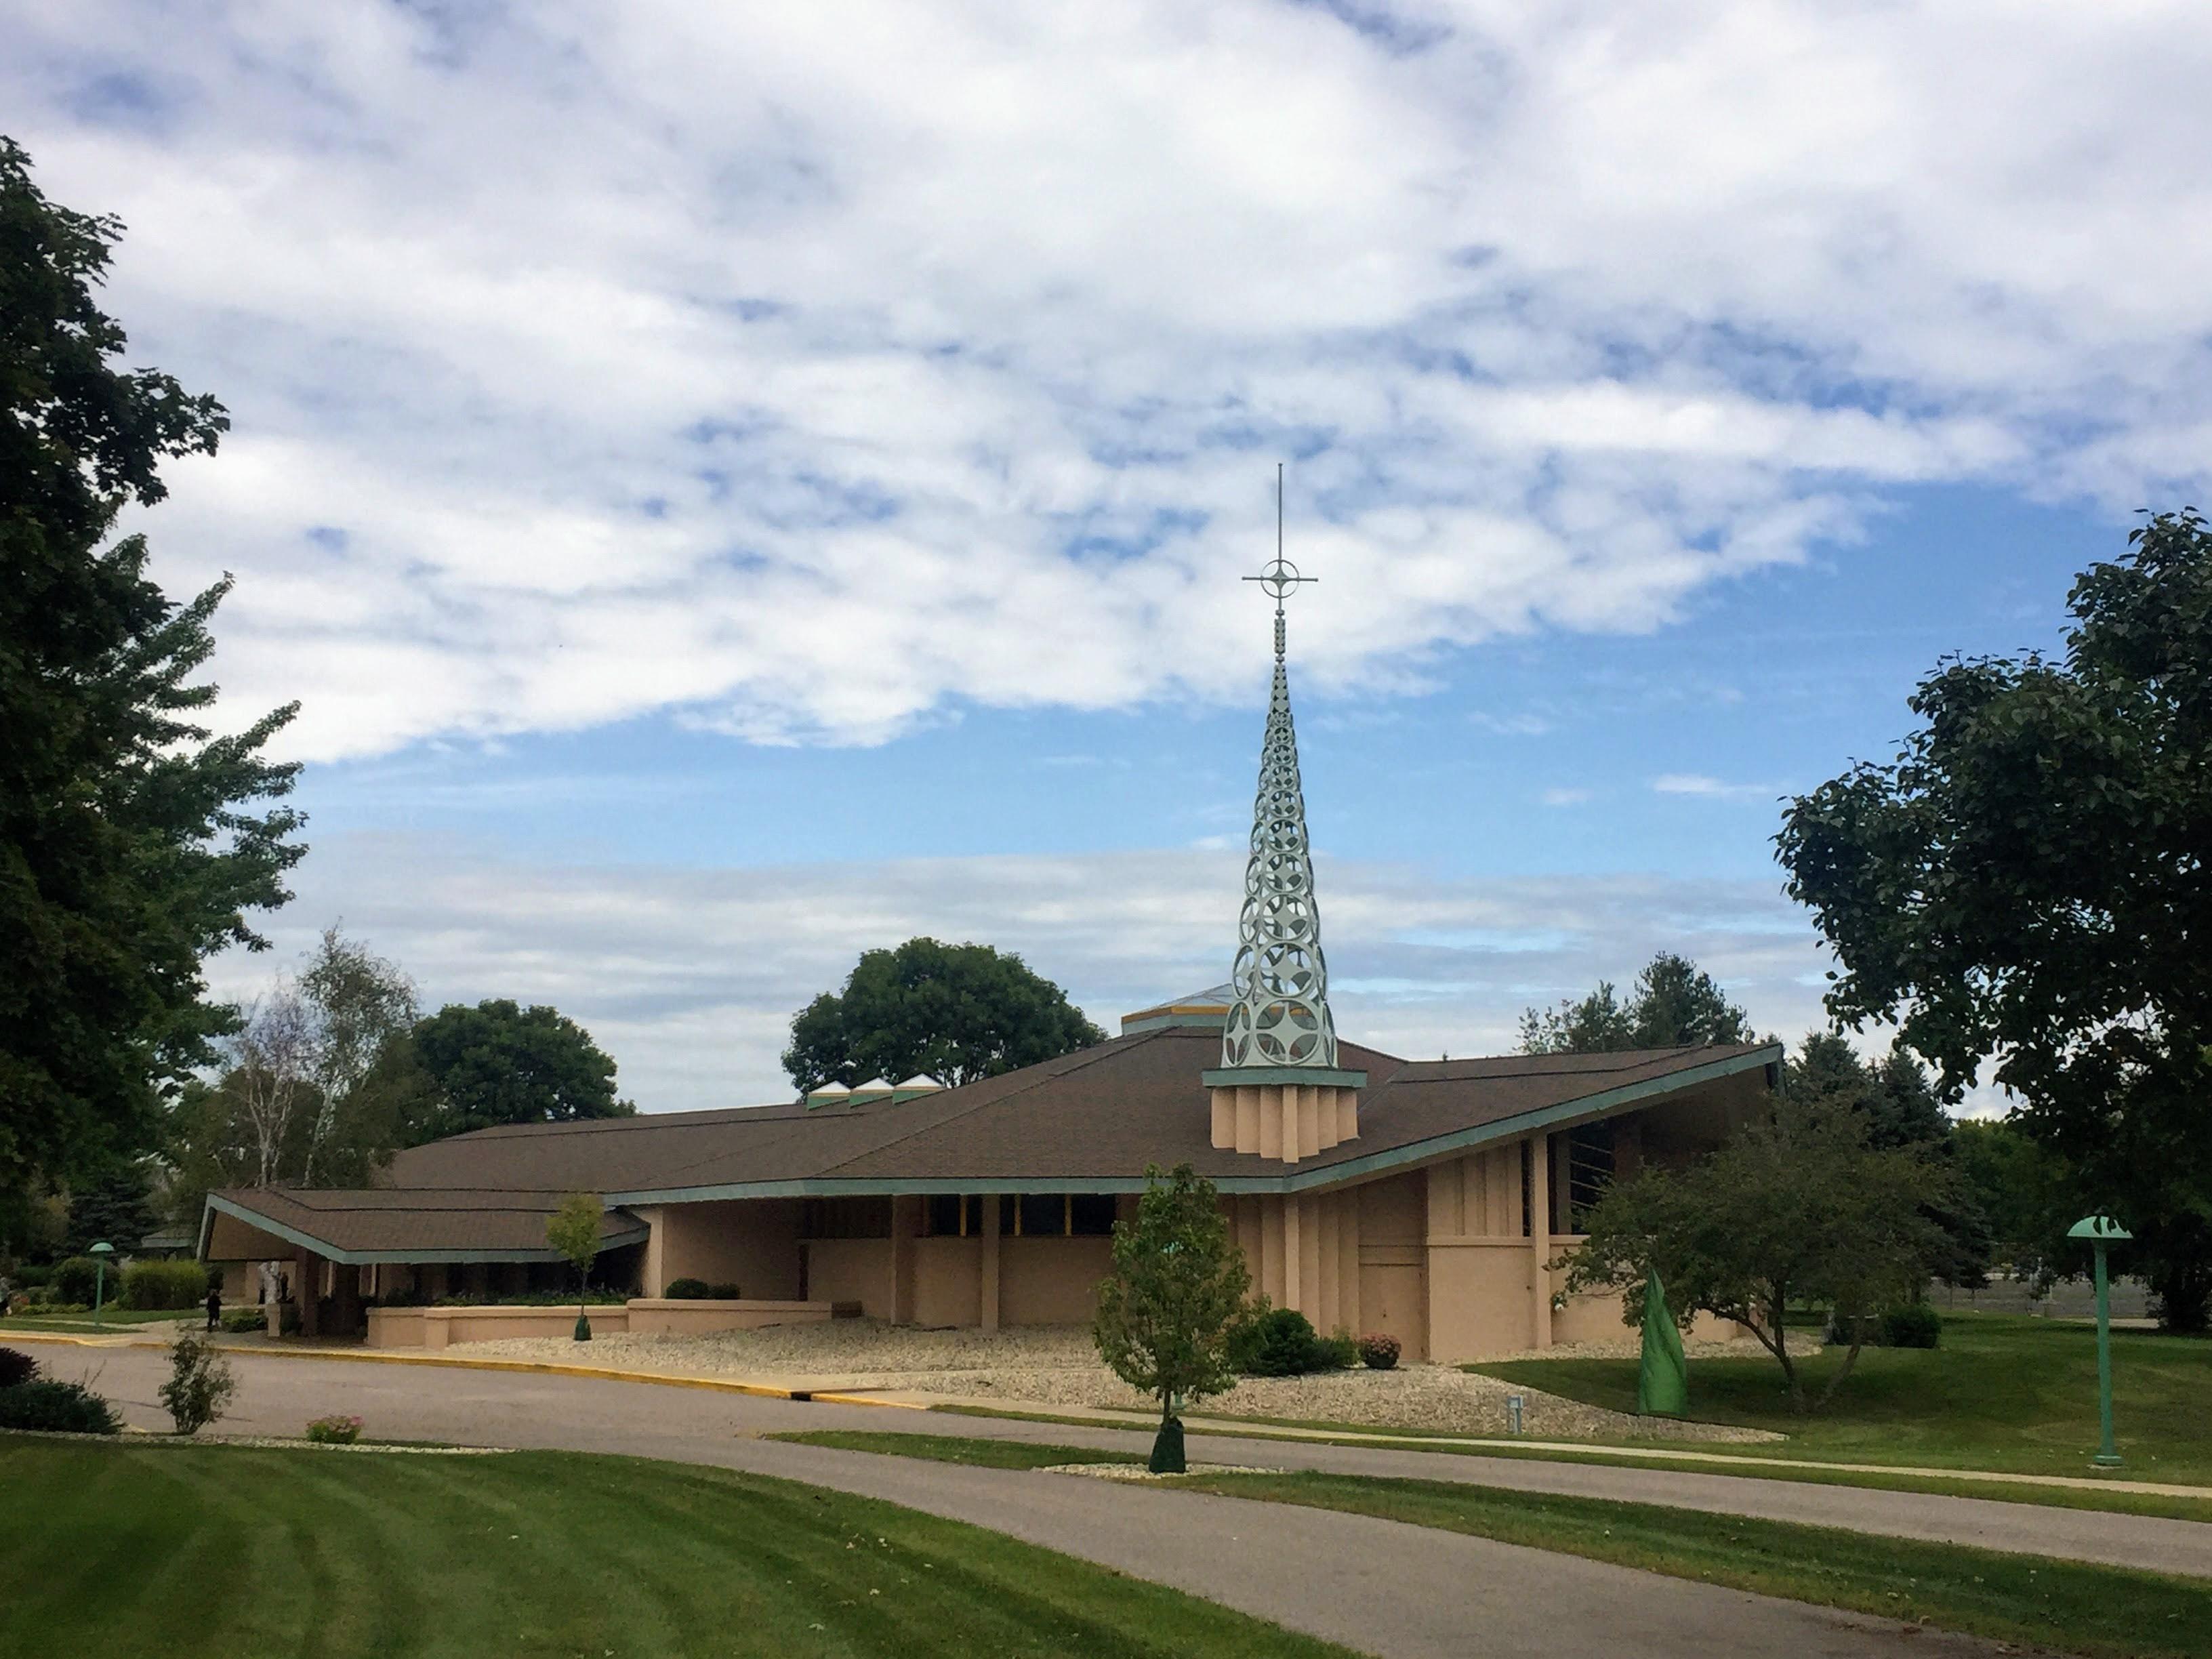 2017-09-07 Cathlic Church 01